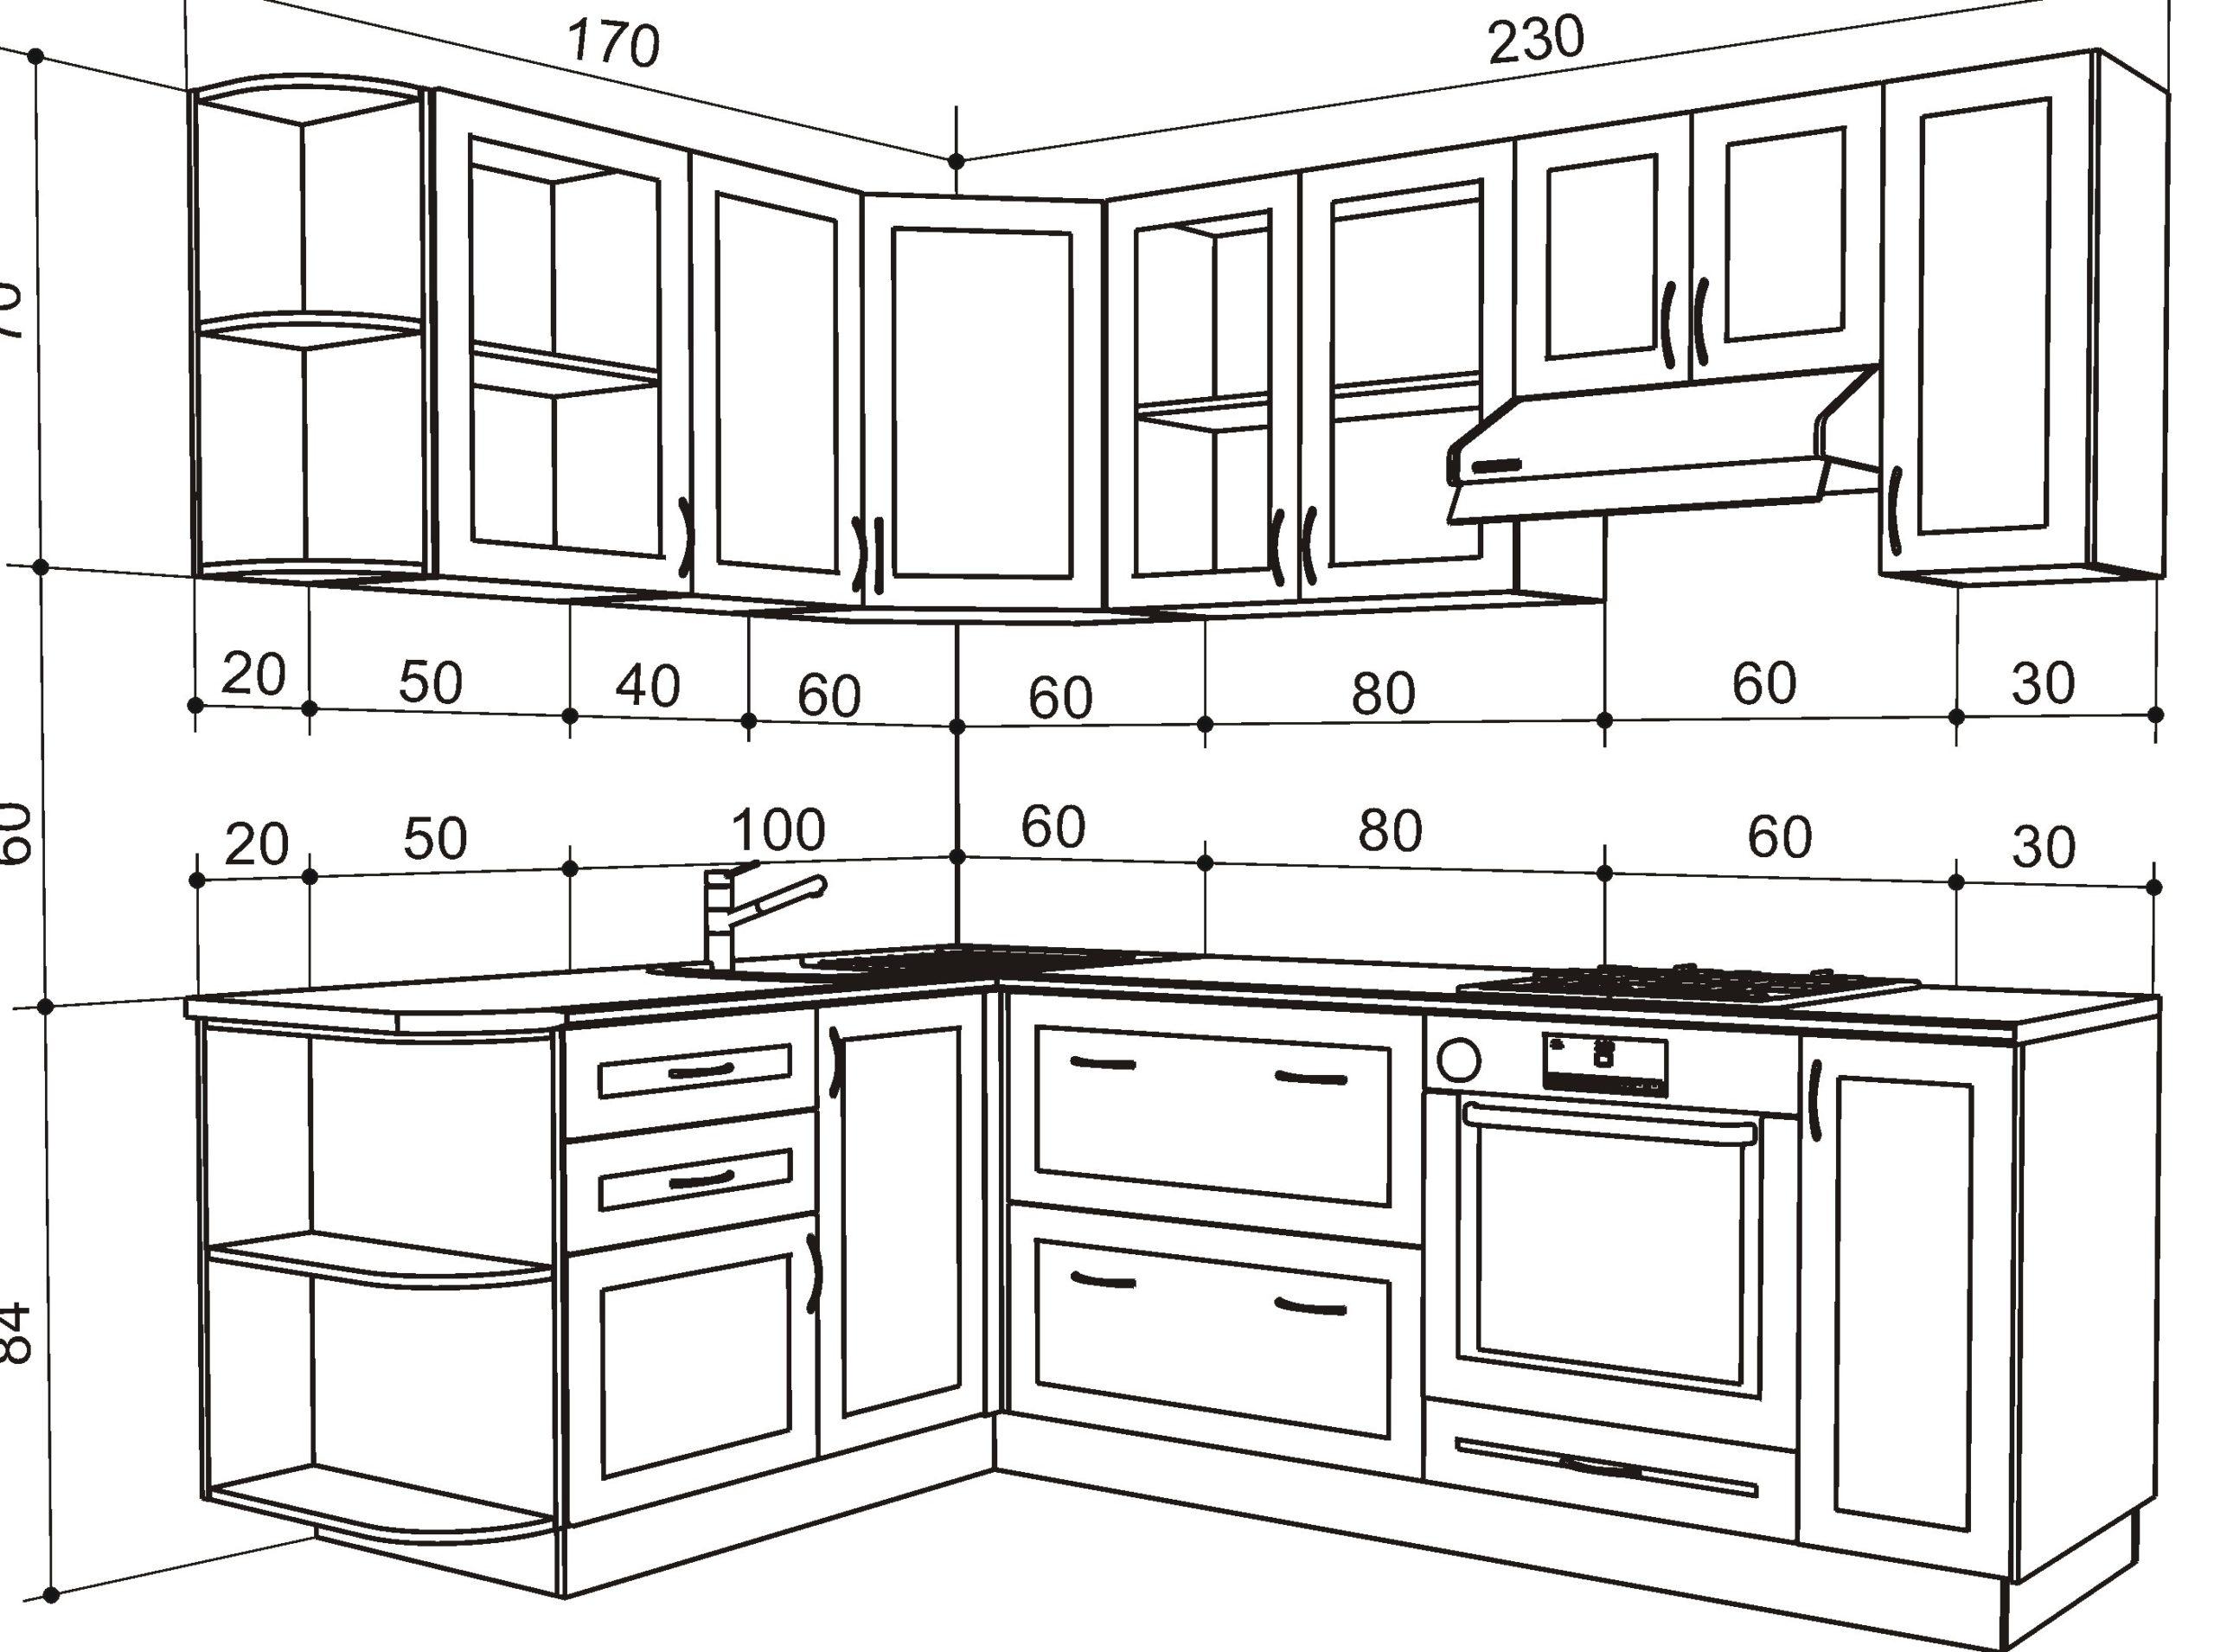 чертеж кухонных шкафов стандартный